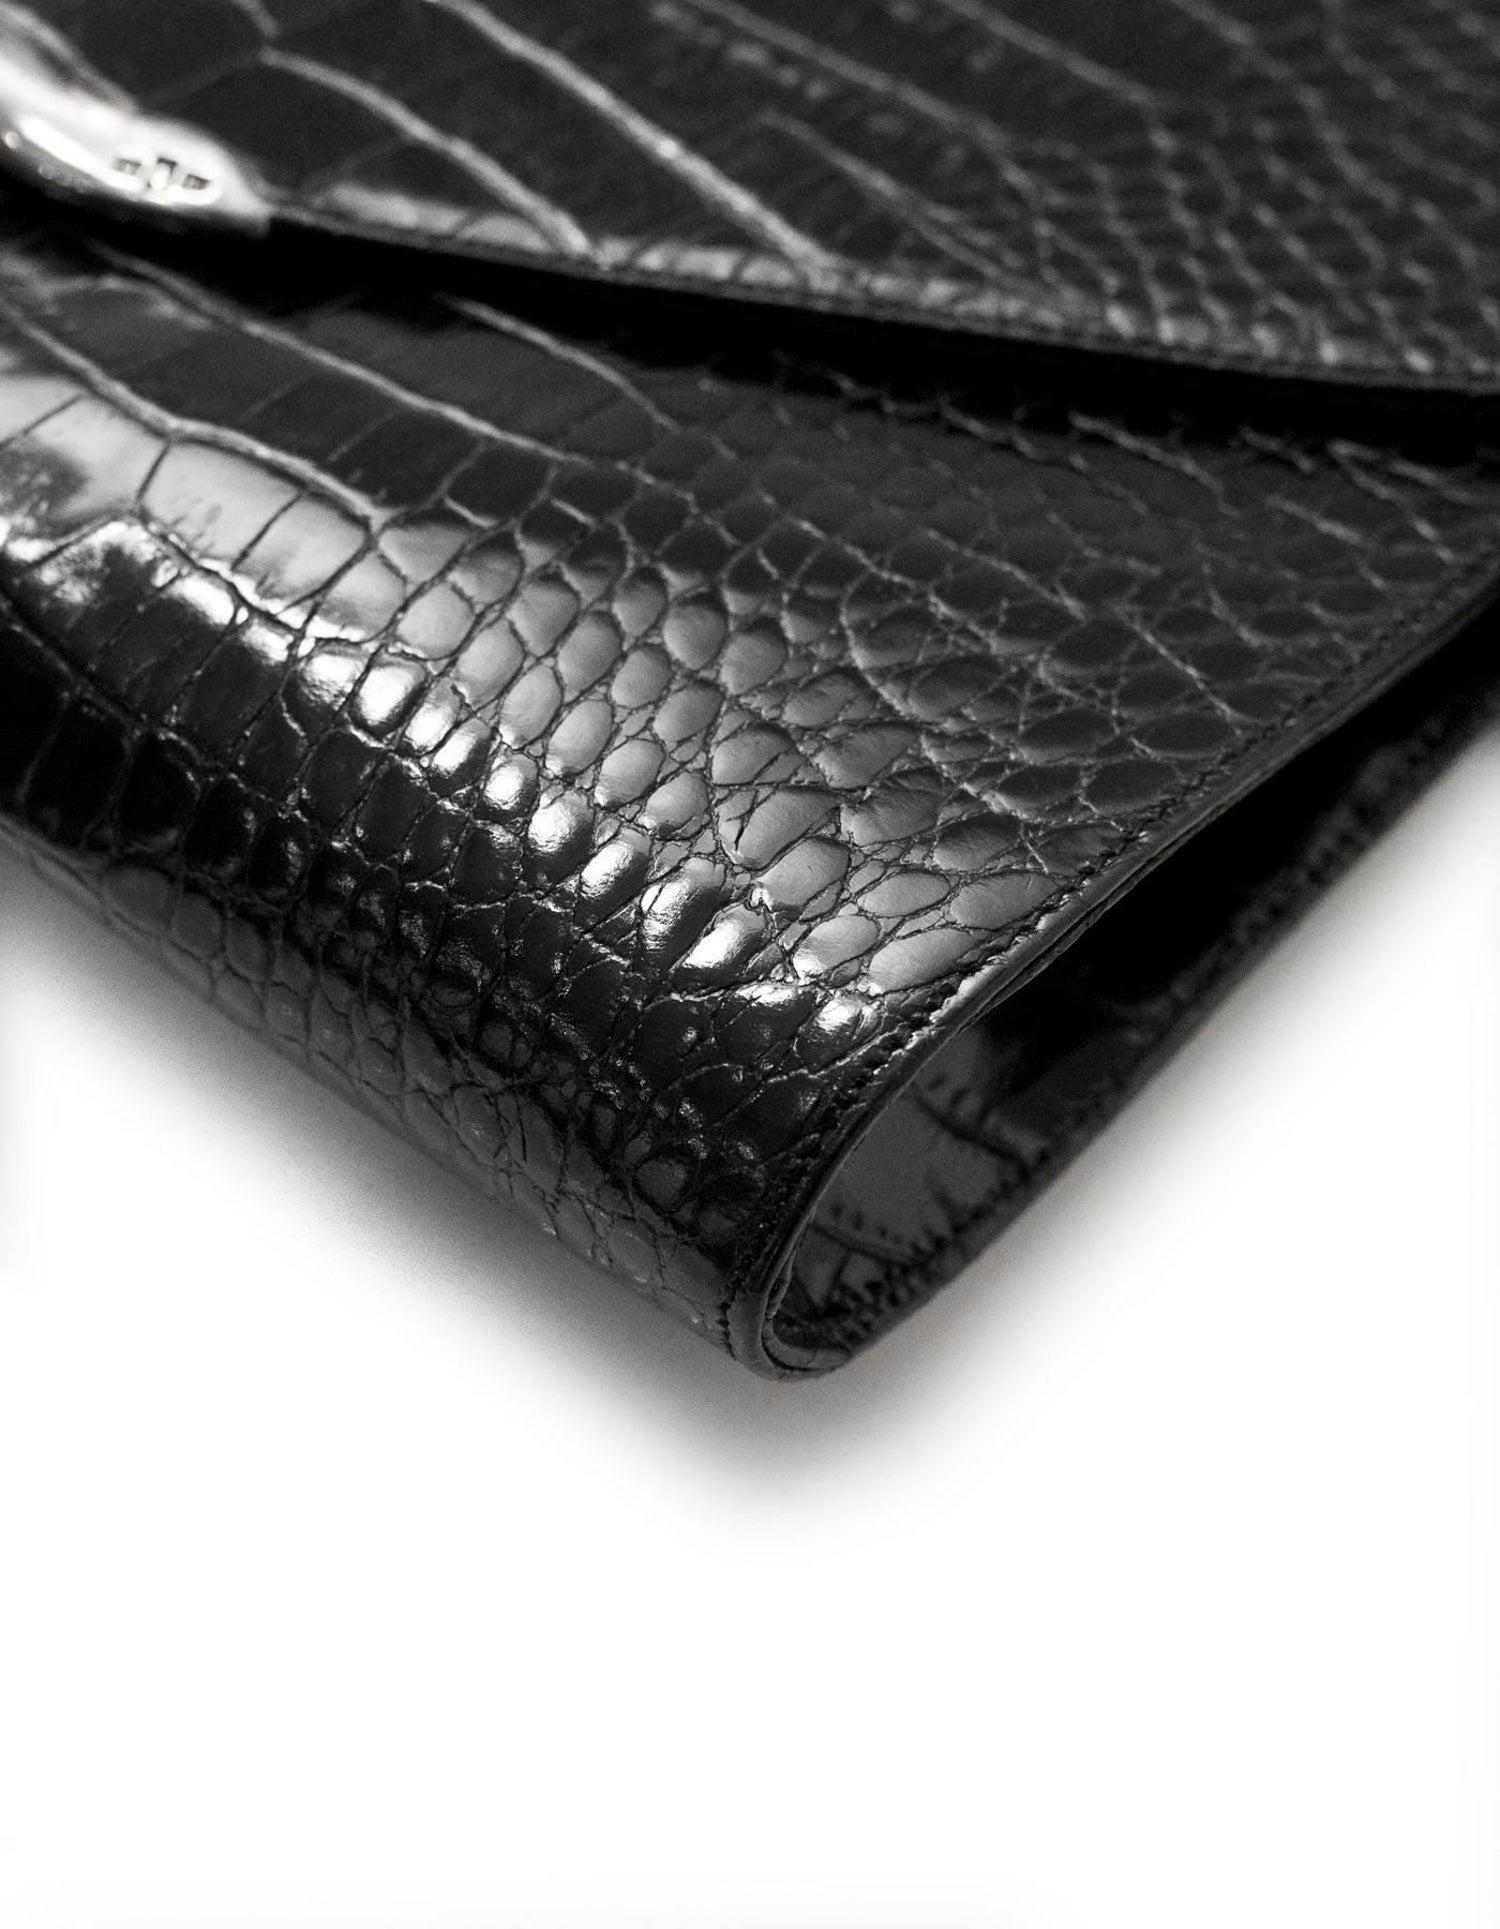 Ralph Lauren Black Embossed Crocodile Crossbody Bag at 1stdibs 8493988b1e017